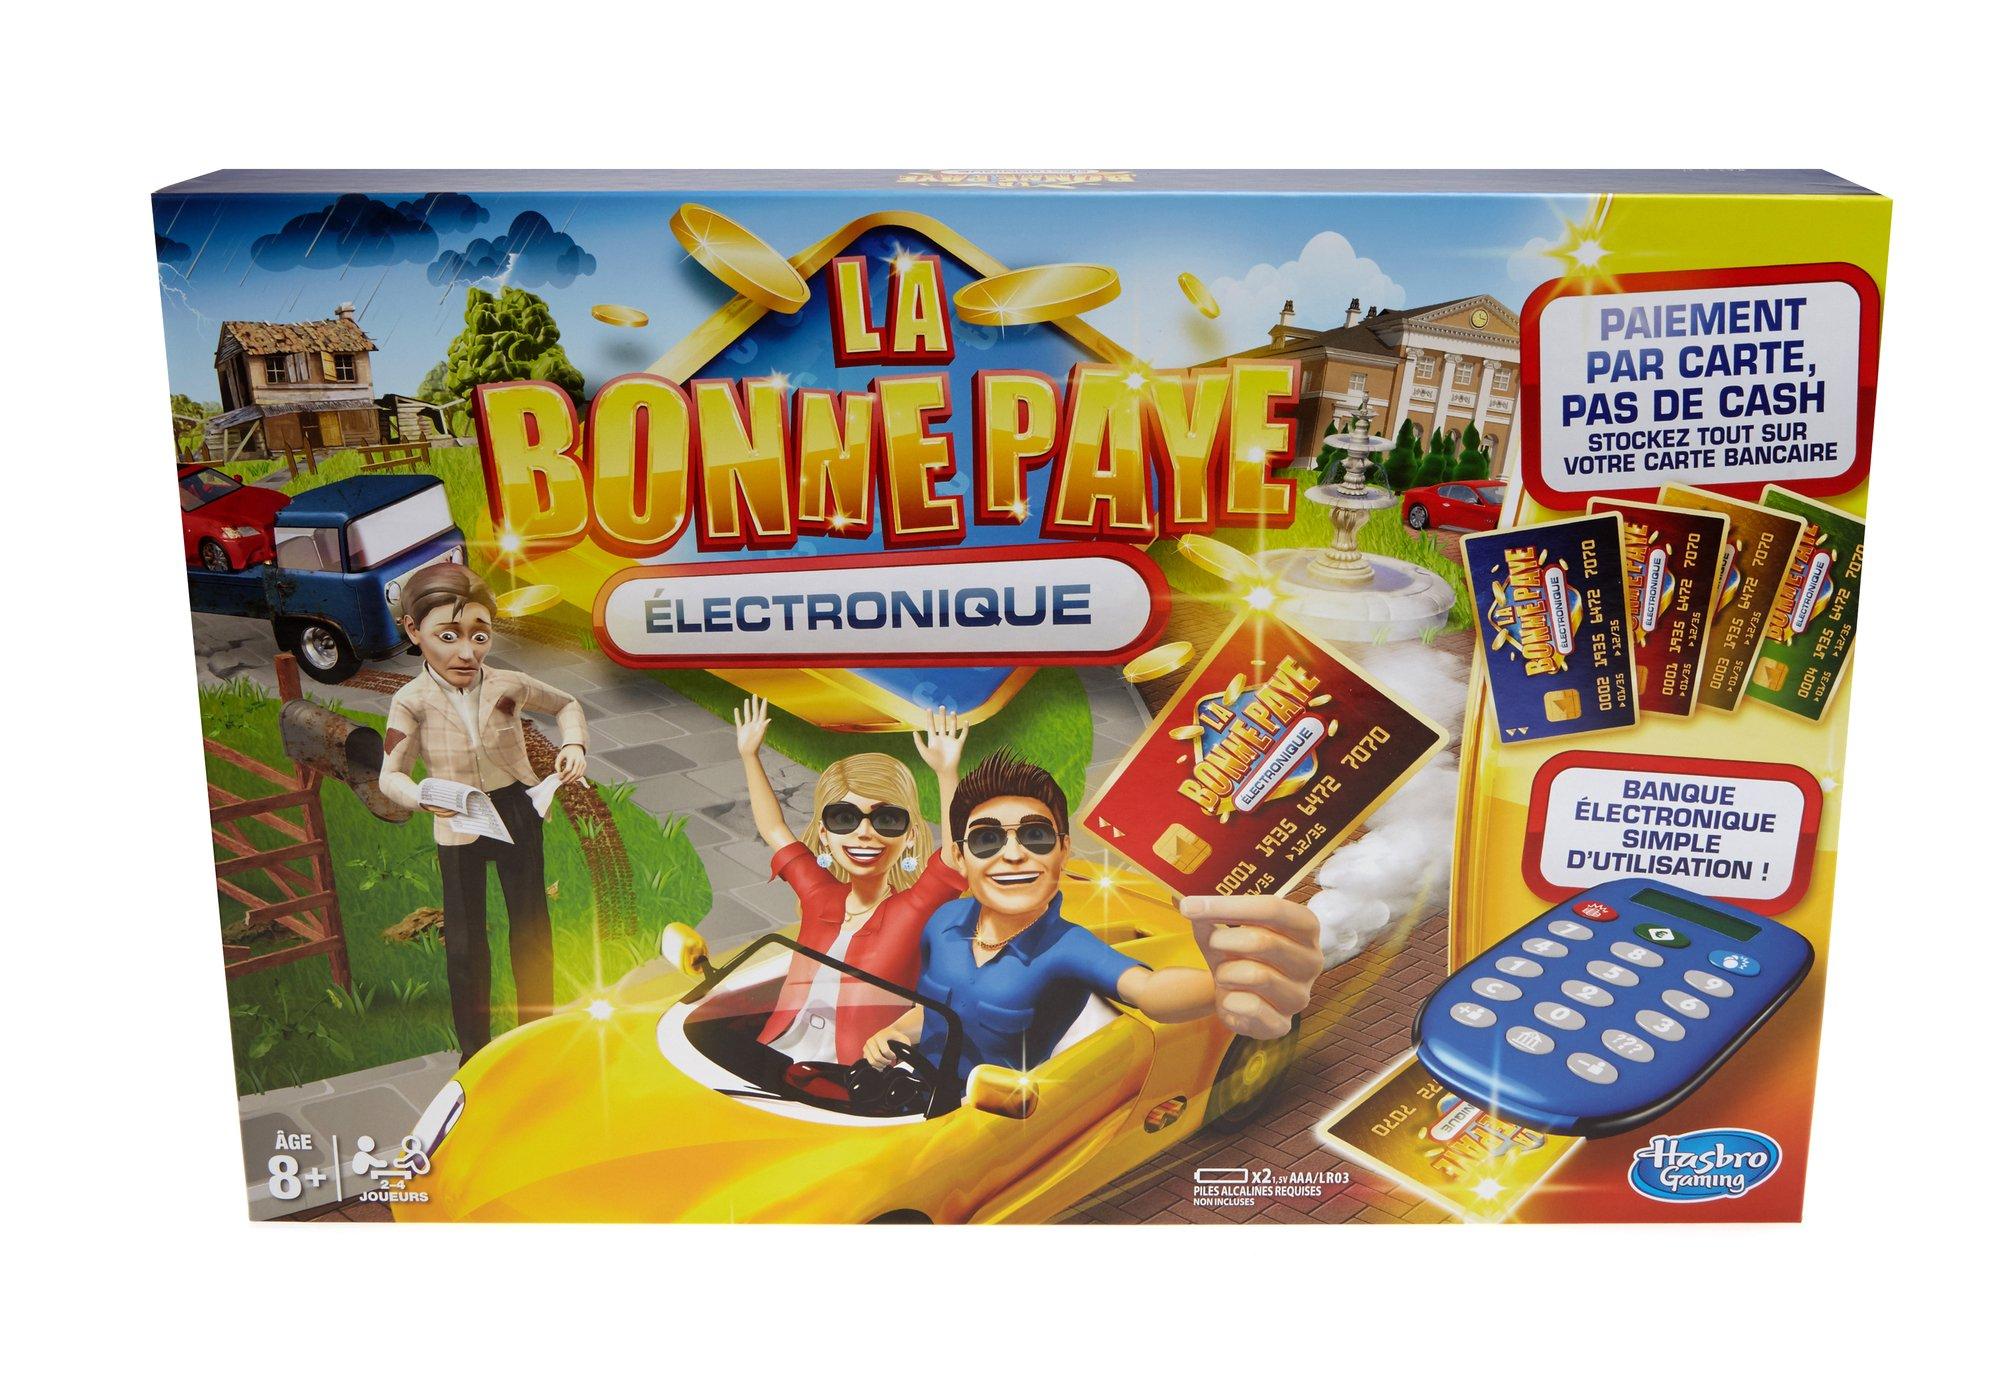 Hasbro - La Bonne Paye Electronique - C16791010 product image